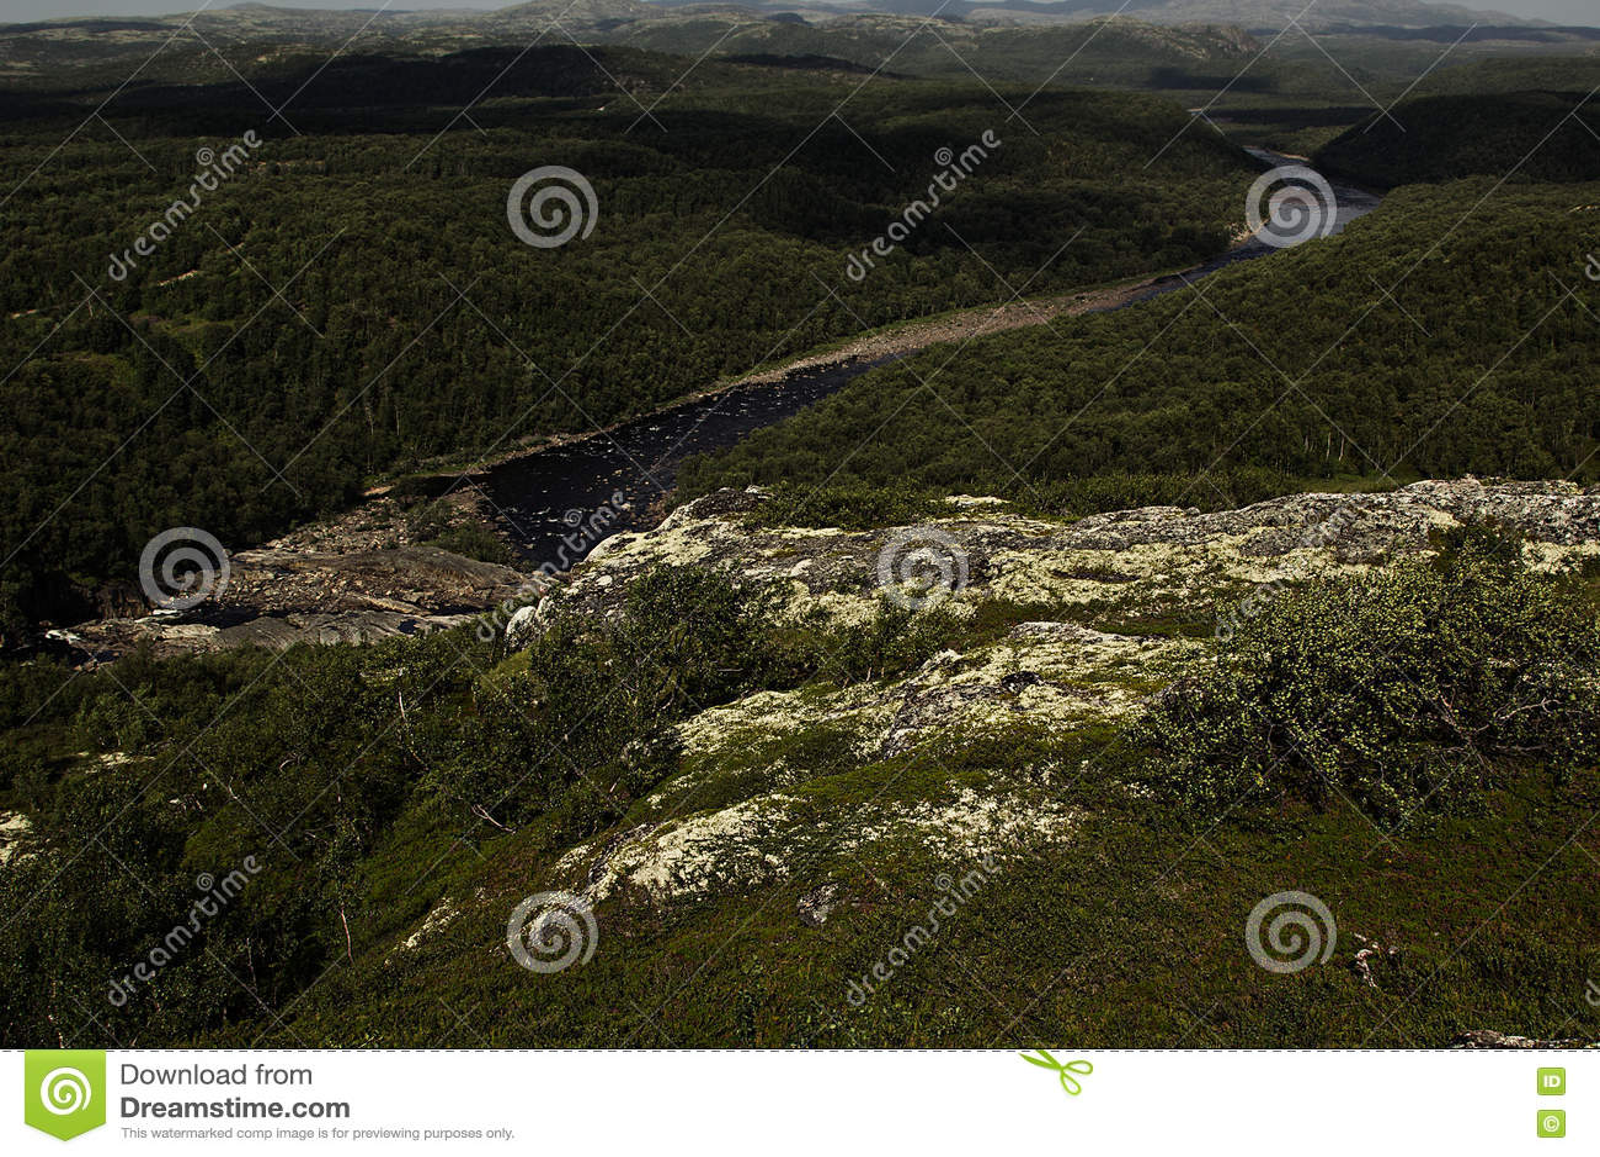 Tundra Soft Top >> Rich Green Moss And Small White Flowers. Stock Photo | CartoonDealer.com #584262